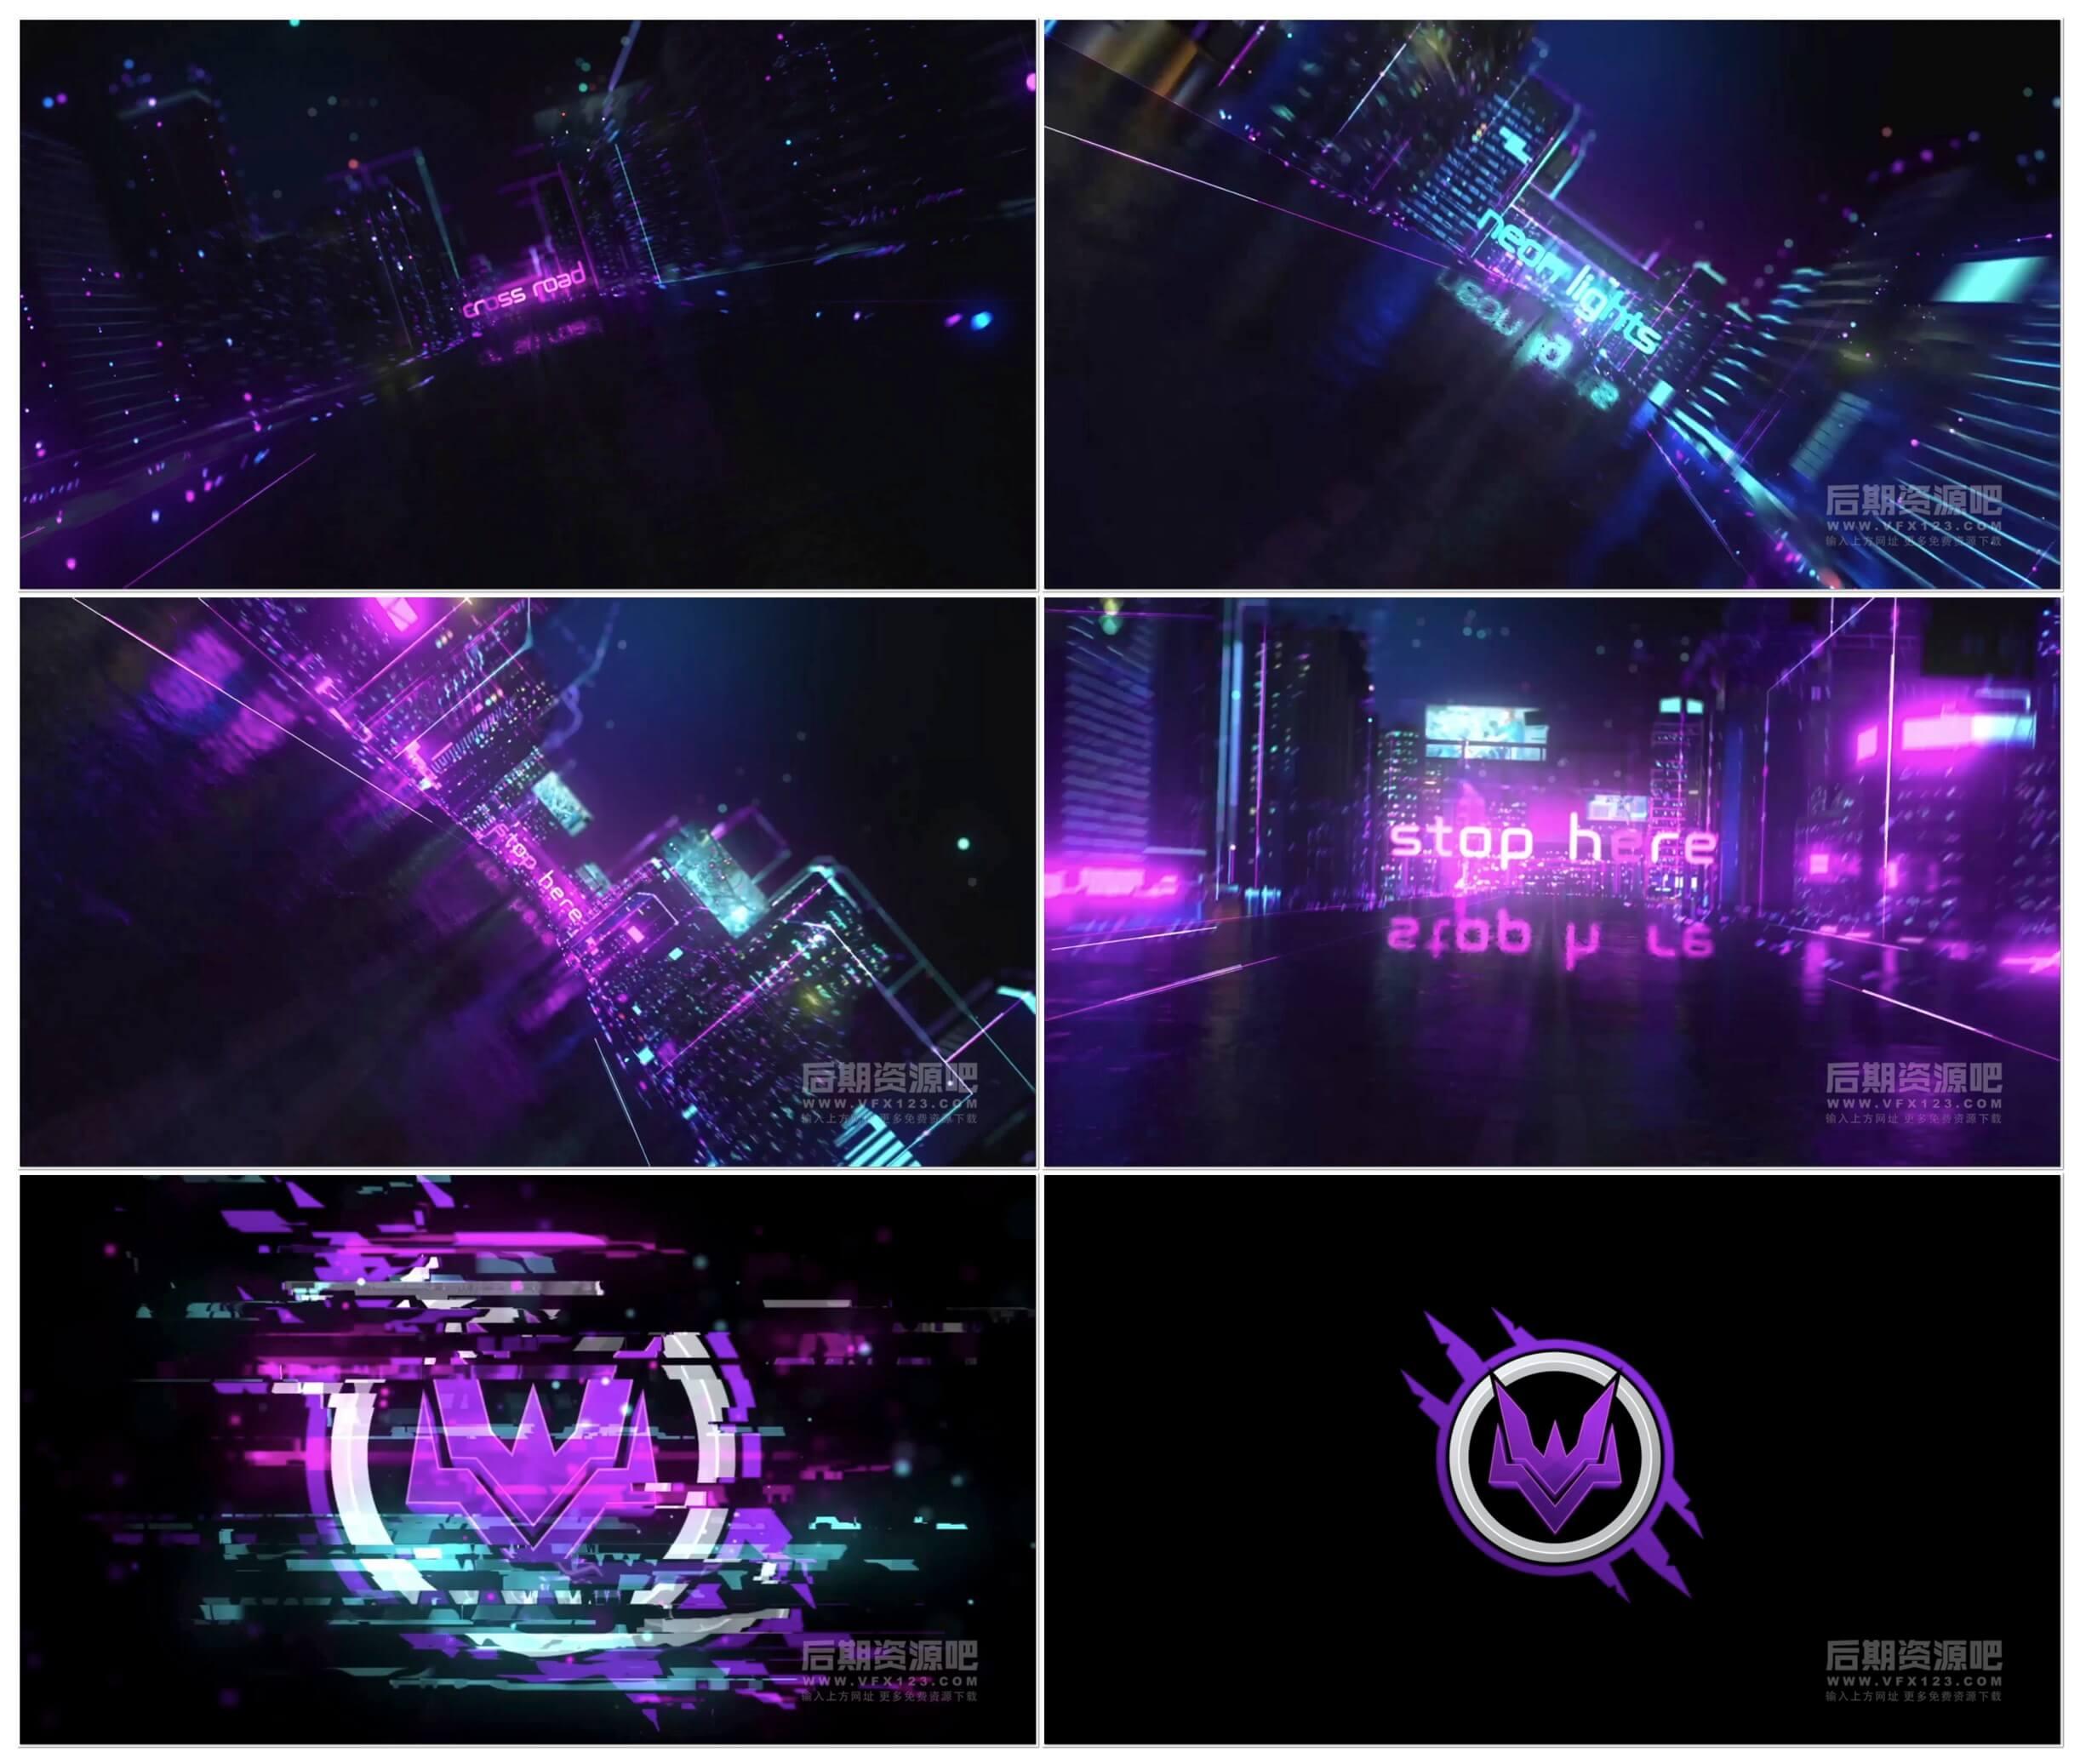 AE模板 赛博朋克风格科幻电影片头模板 Cyberpunk Opener